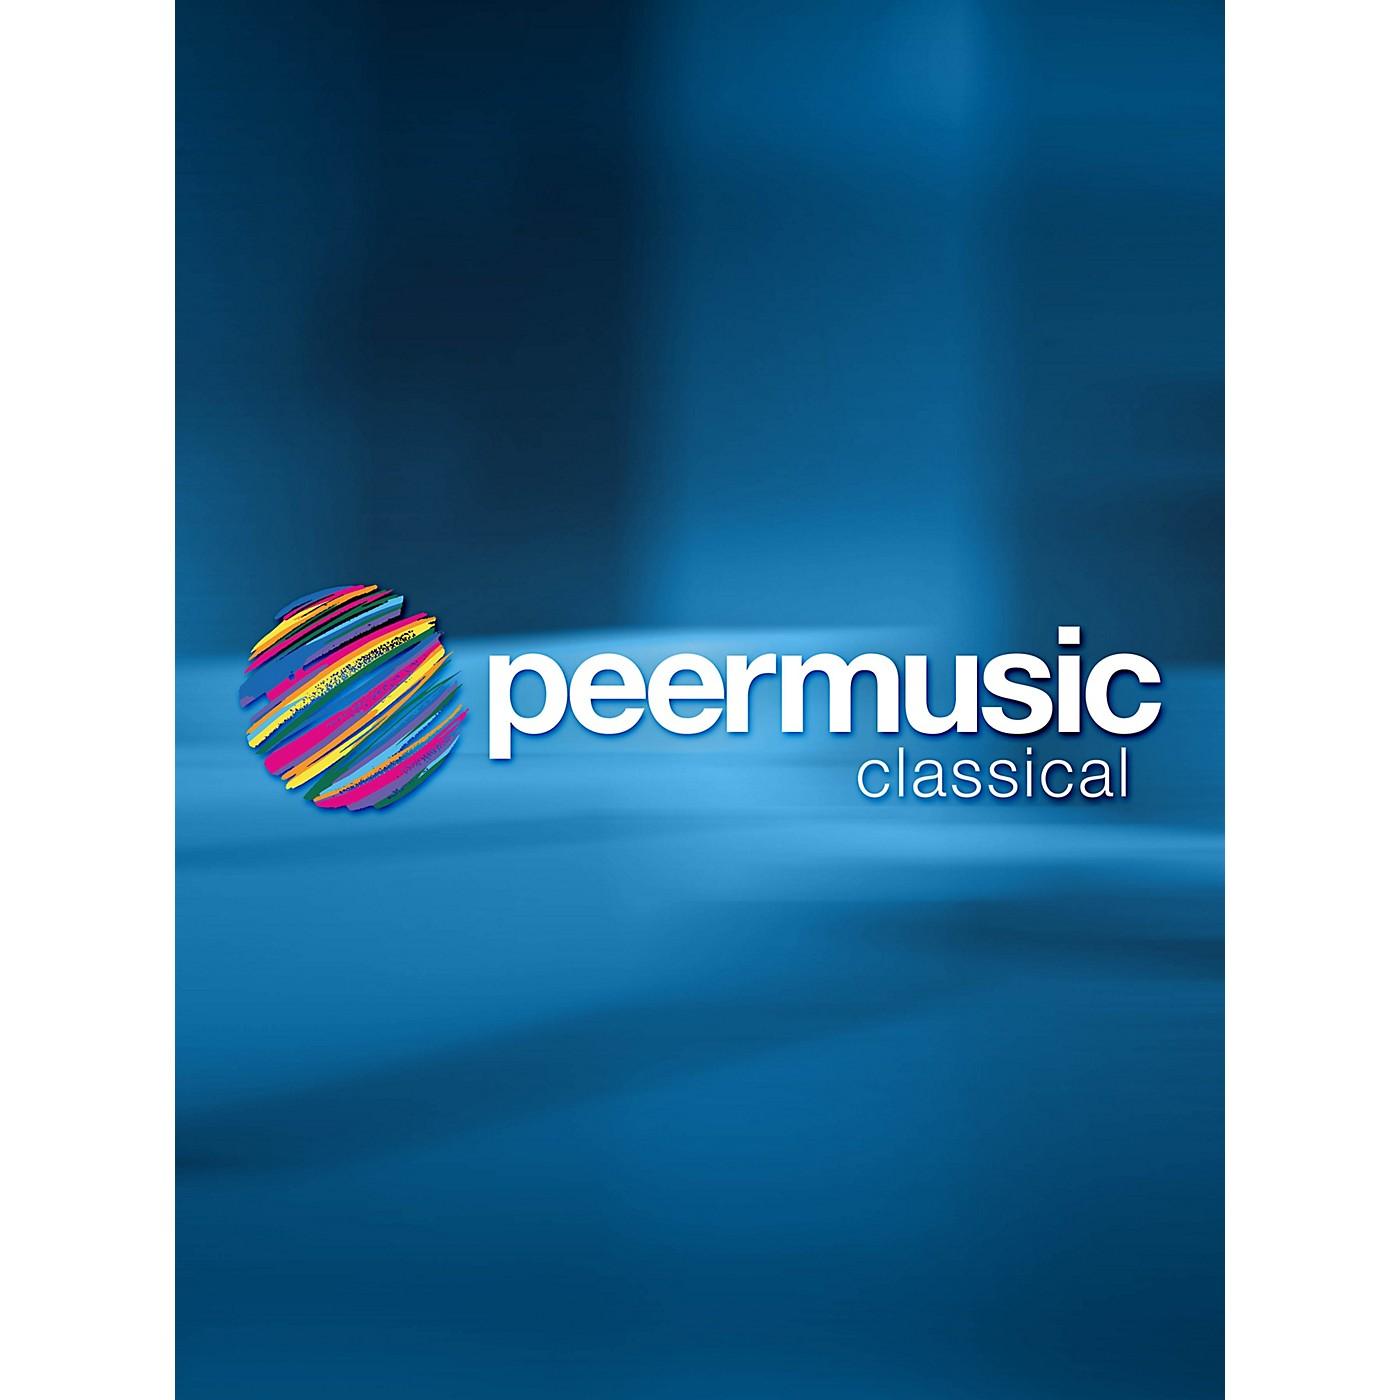 Peer Music Cuarteto (Saxophone Quartet Study Score) Peermusic Classical Series Book  by Jose Serebrier thumbnail